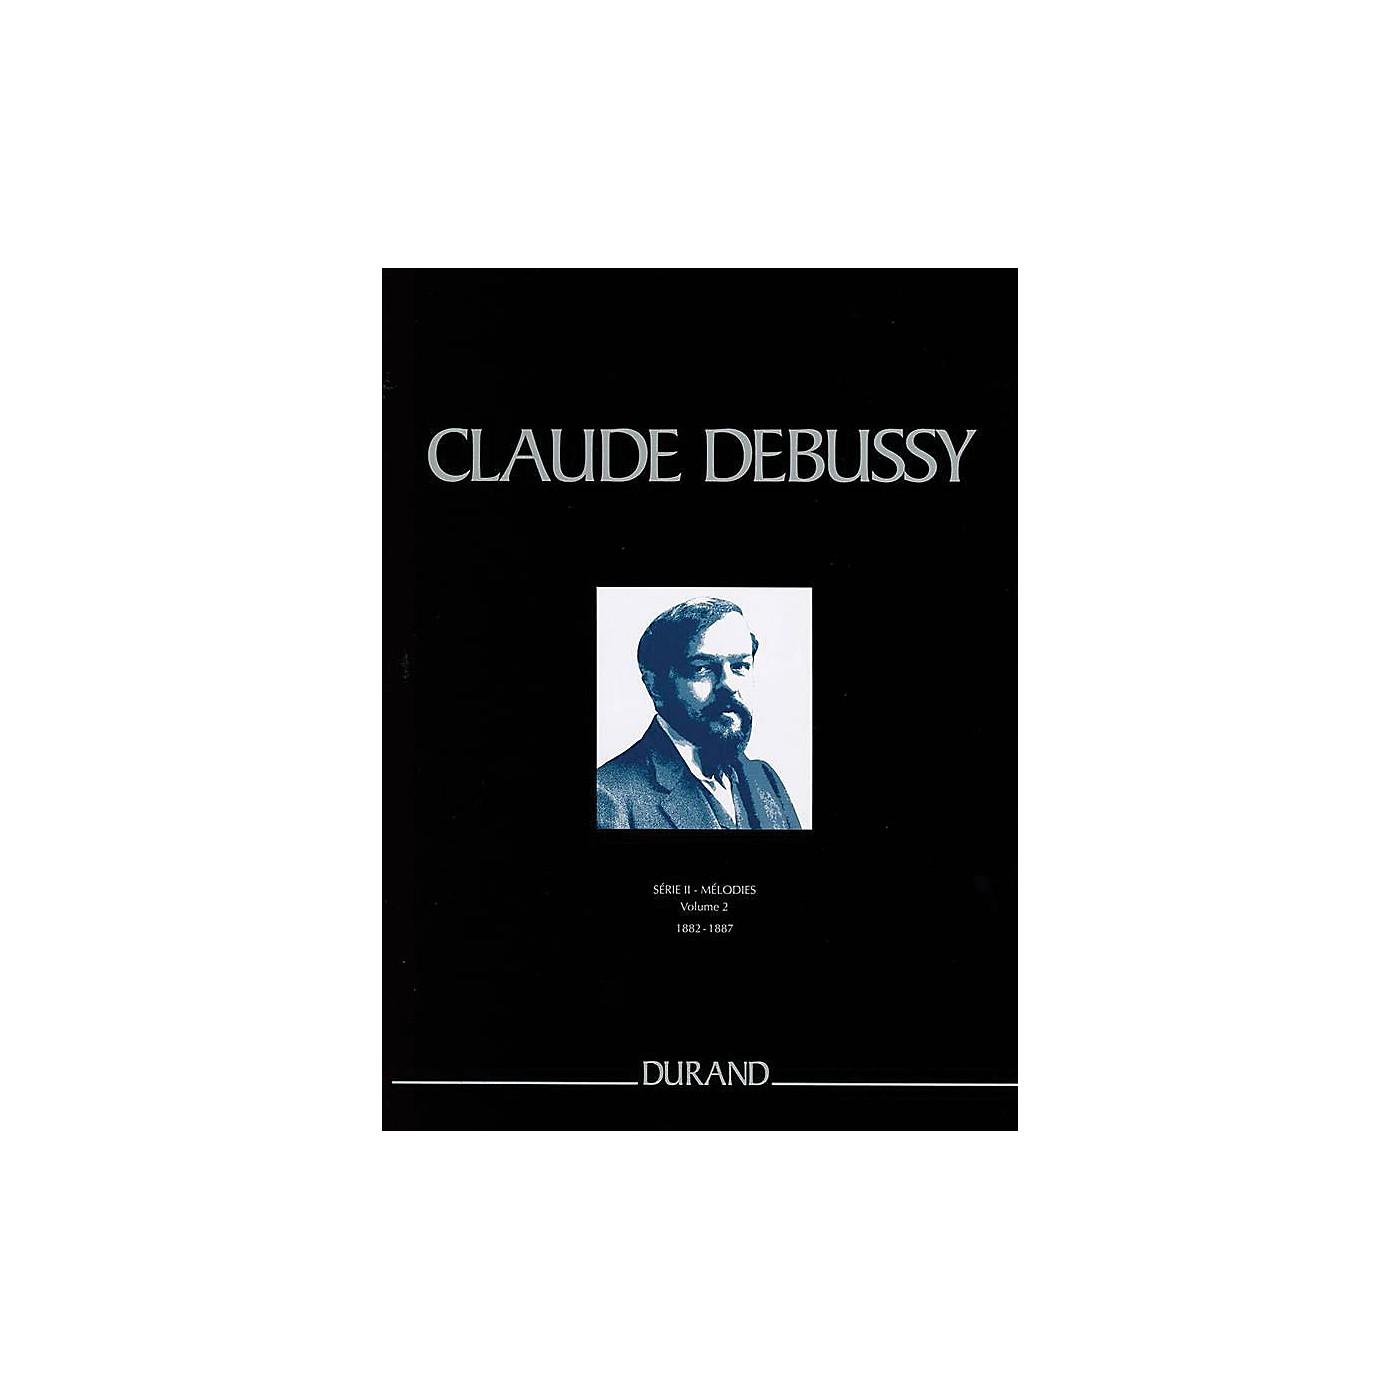 Durand Mélodies de 1882 à 1887 Critical Ed Full Score, Hardbound by Debussy Edited by Edmond Lemaître thumbnail